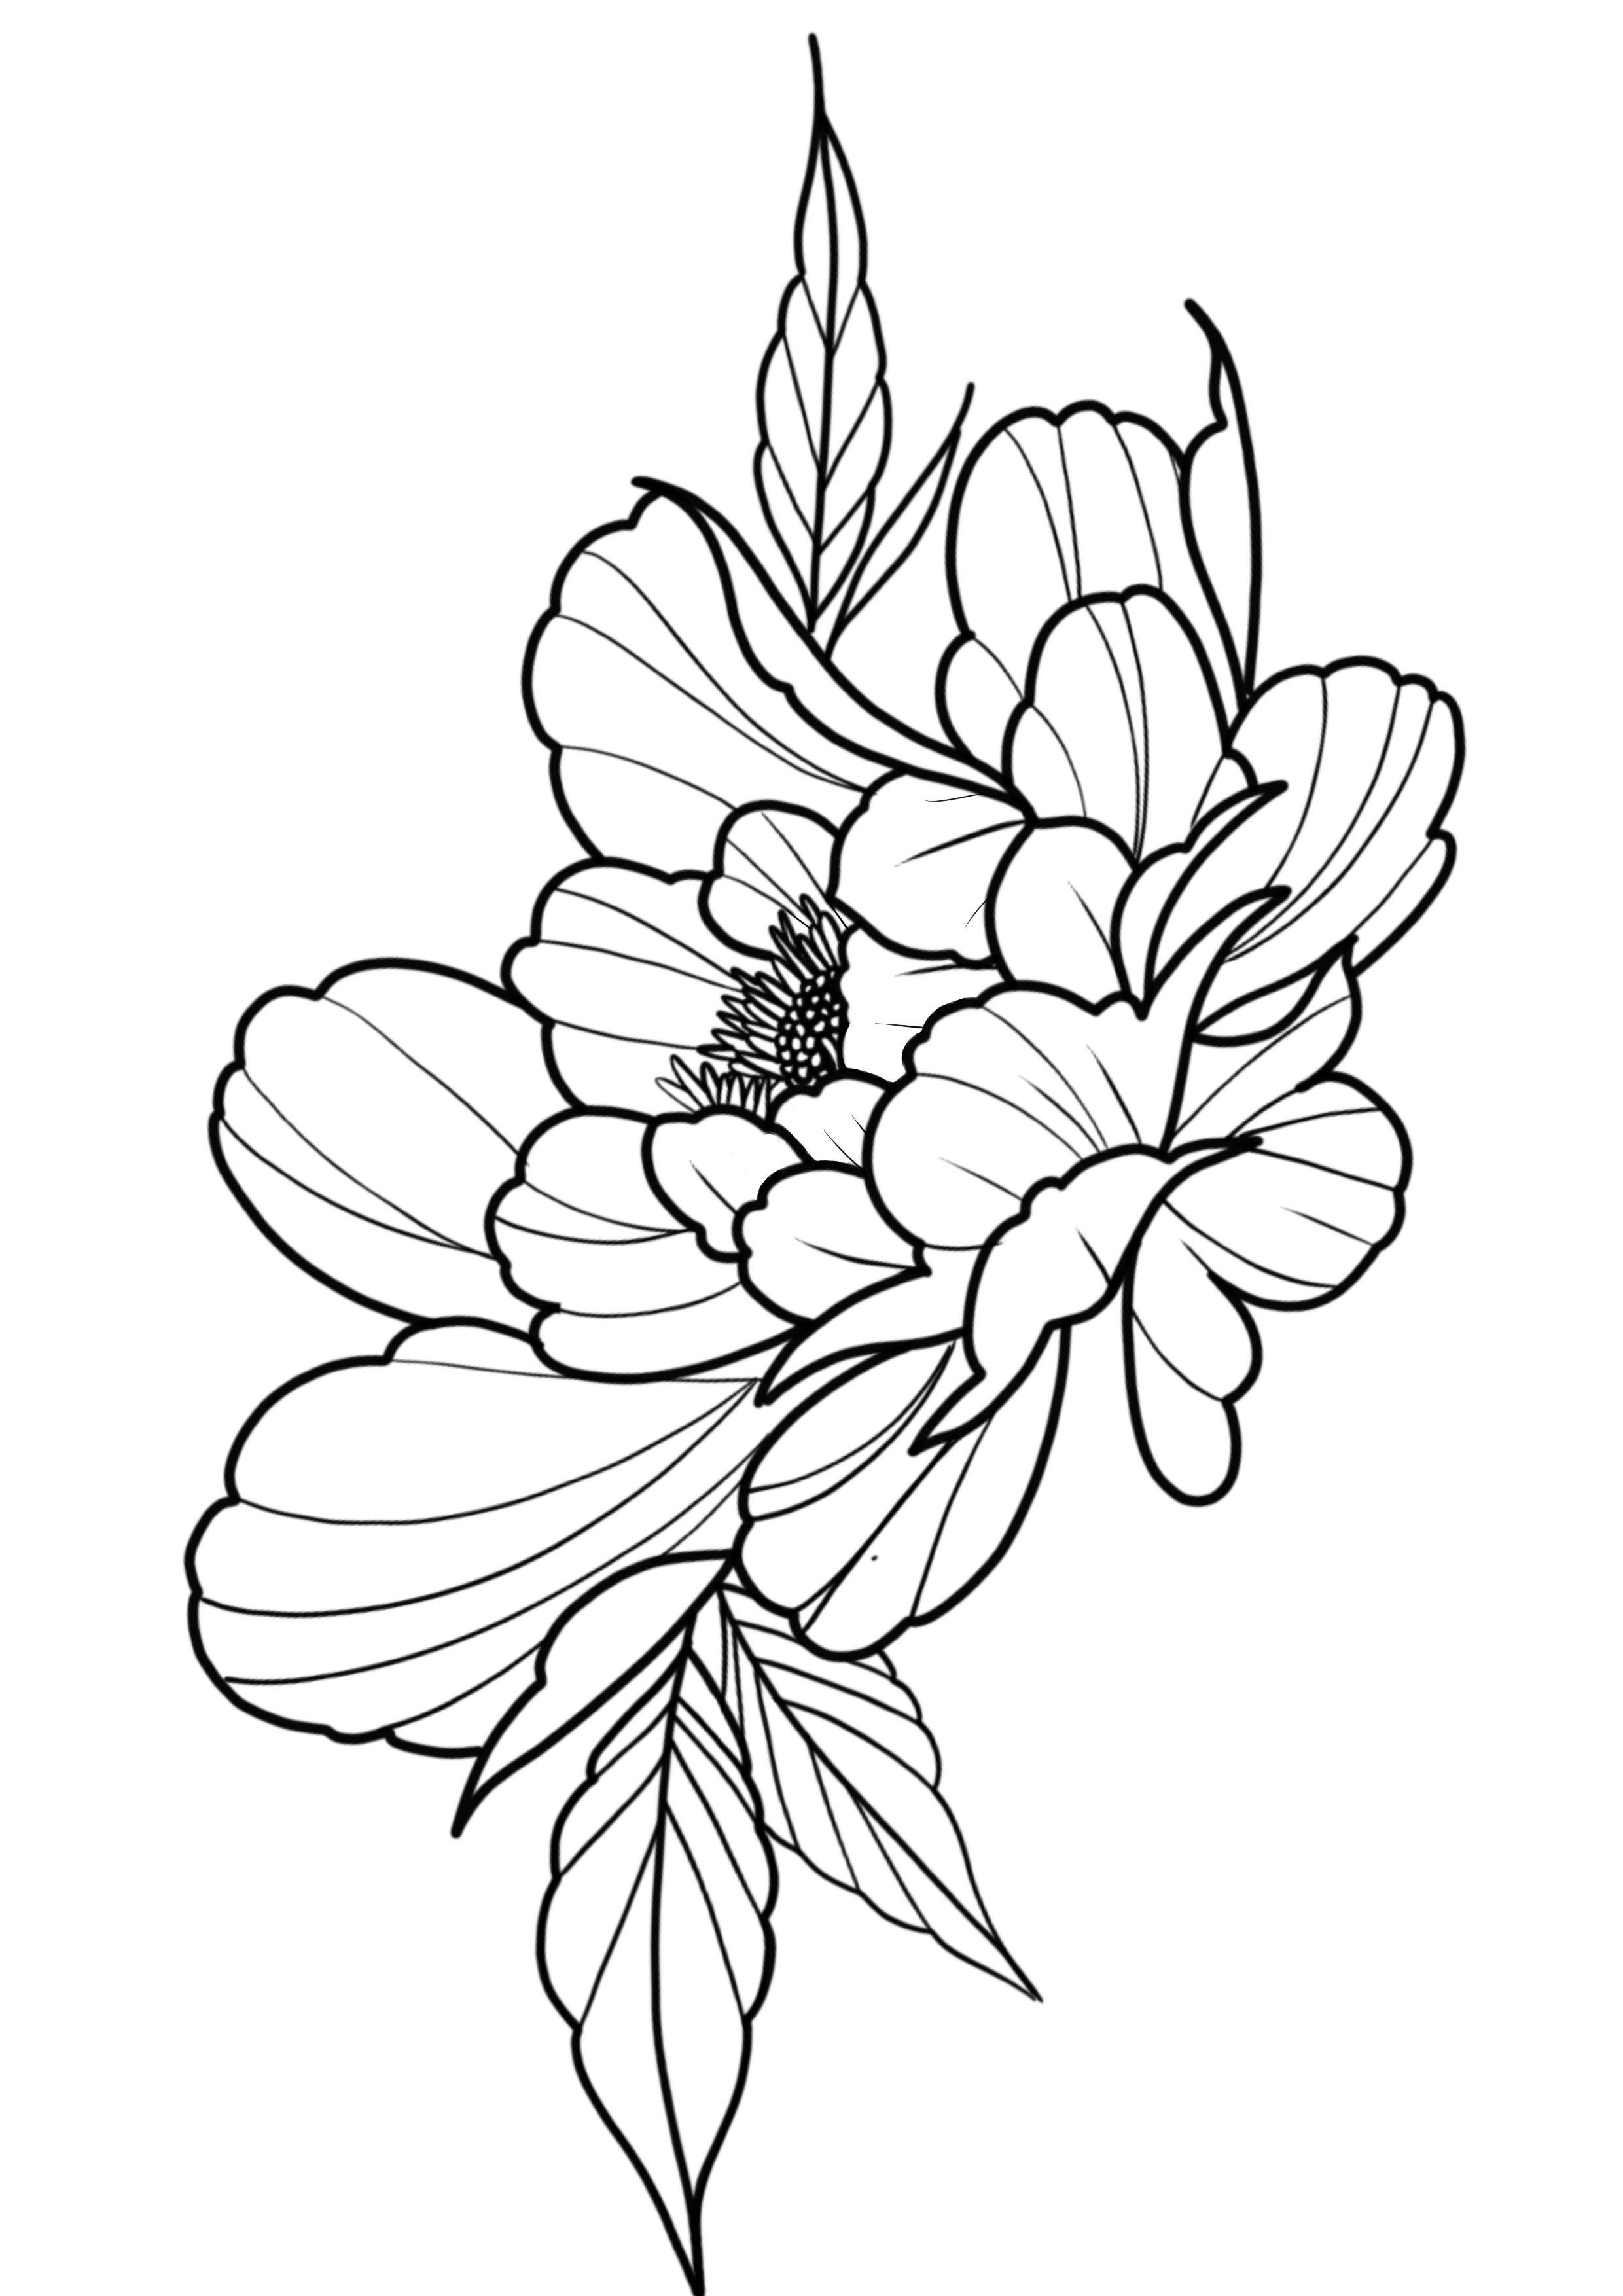 Peony Tattoo Design Japanese Flower Tattoo Peony Drawing Peony Illustration